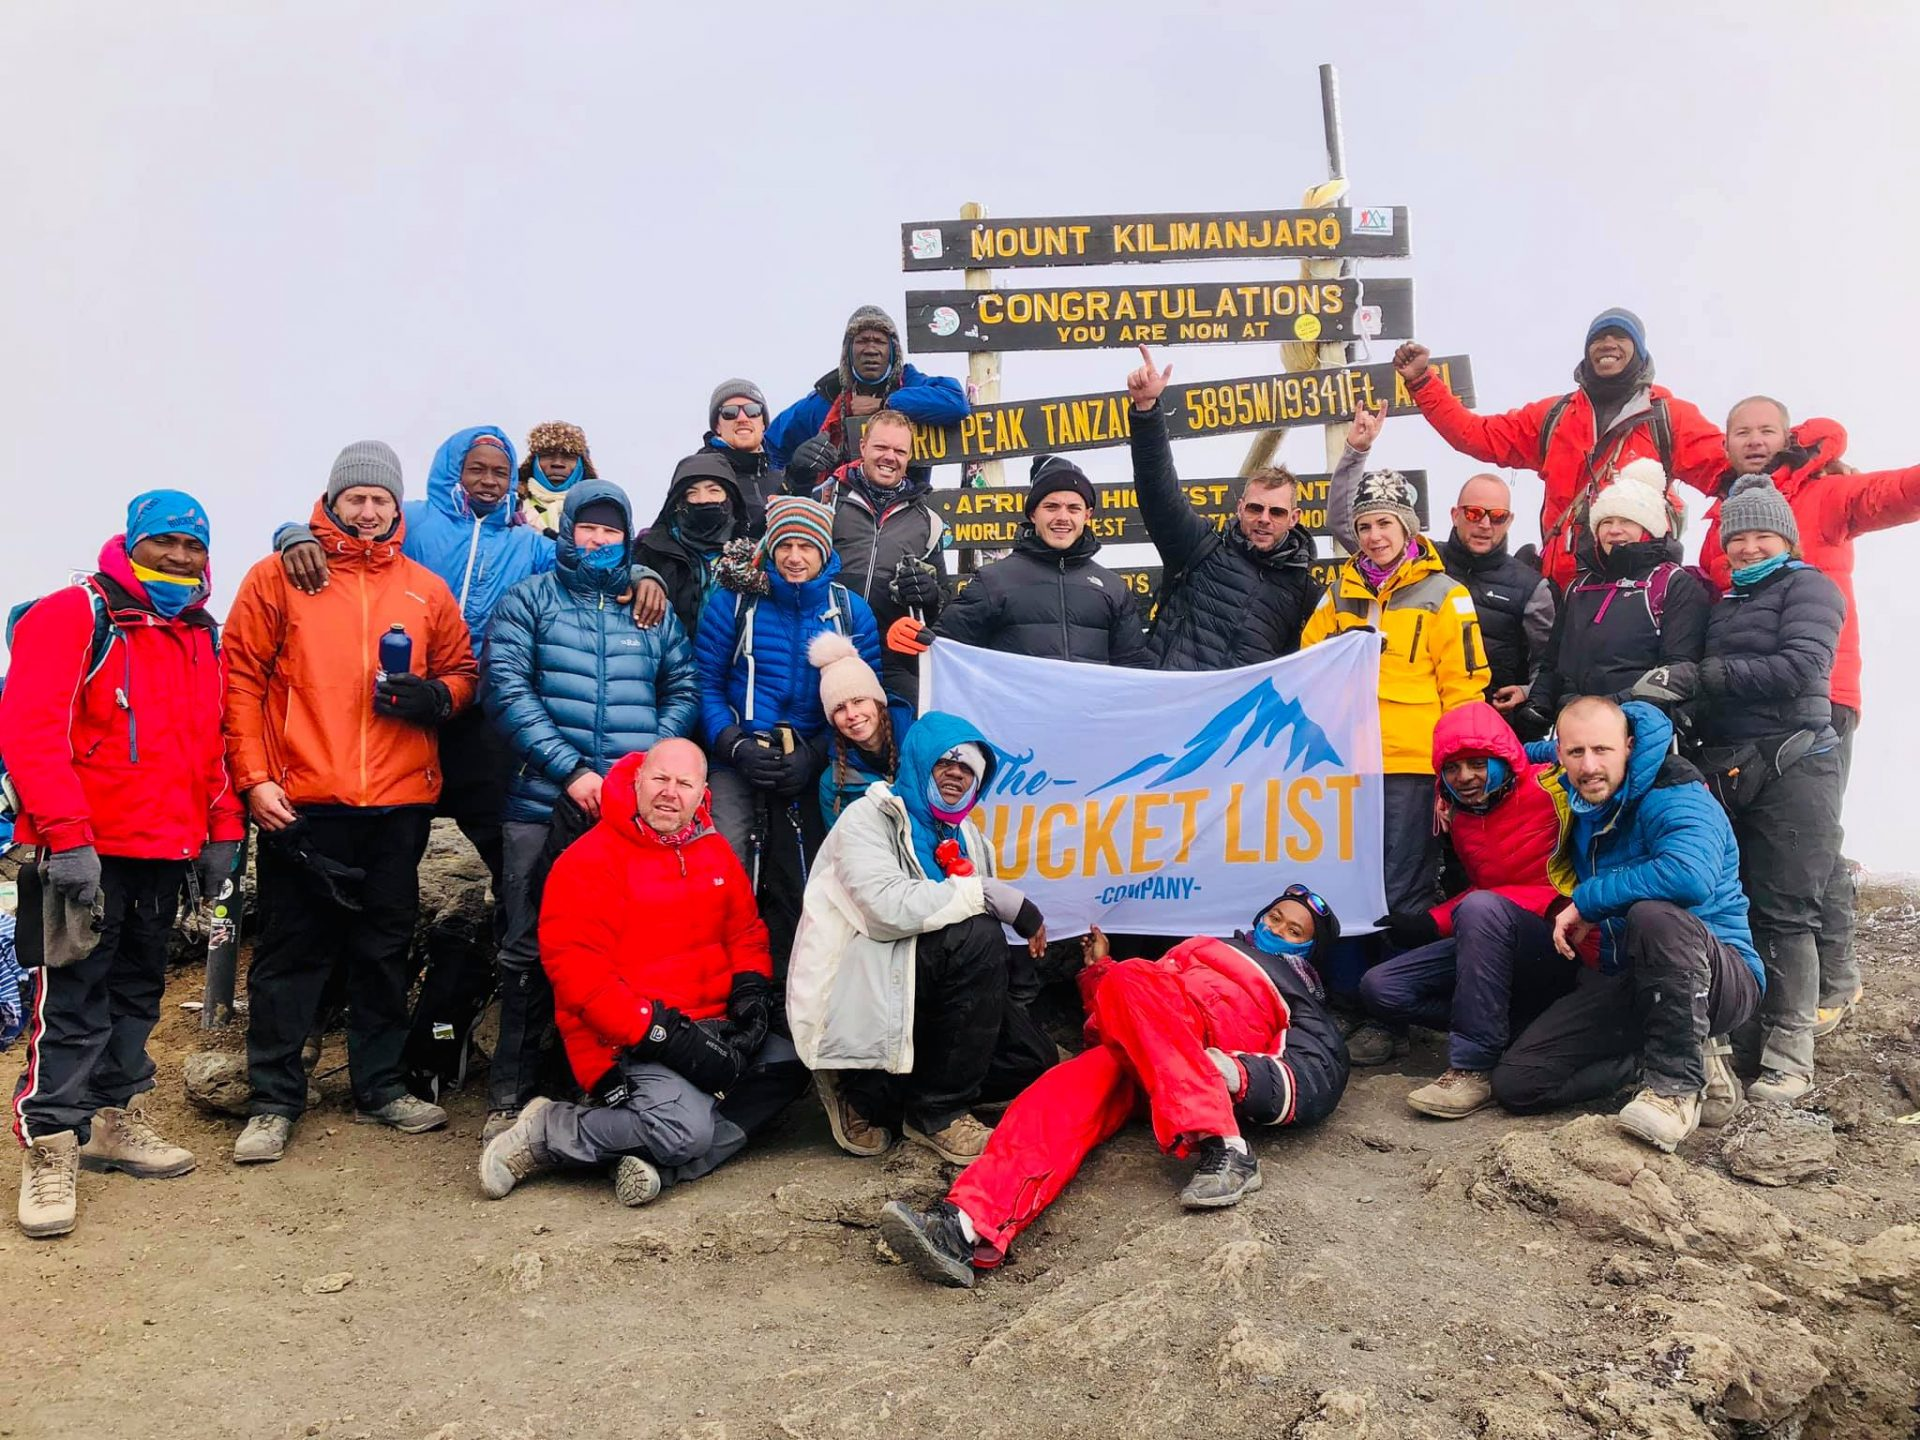 Uhuru Peak, summit photo. Kilimanjaro